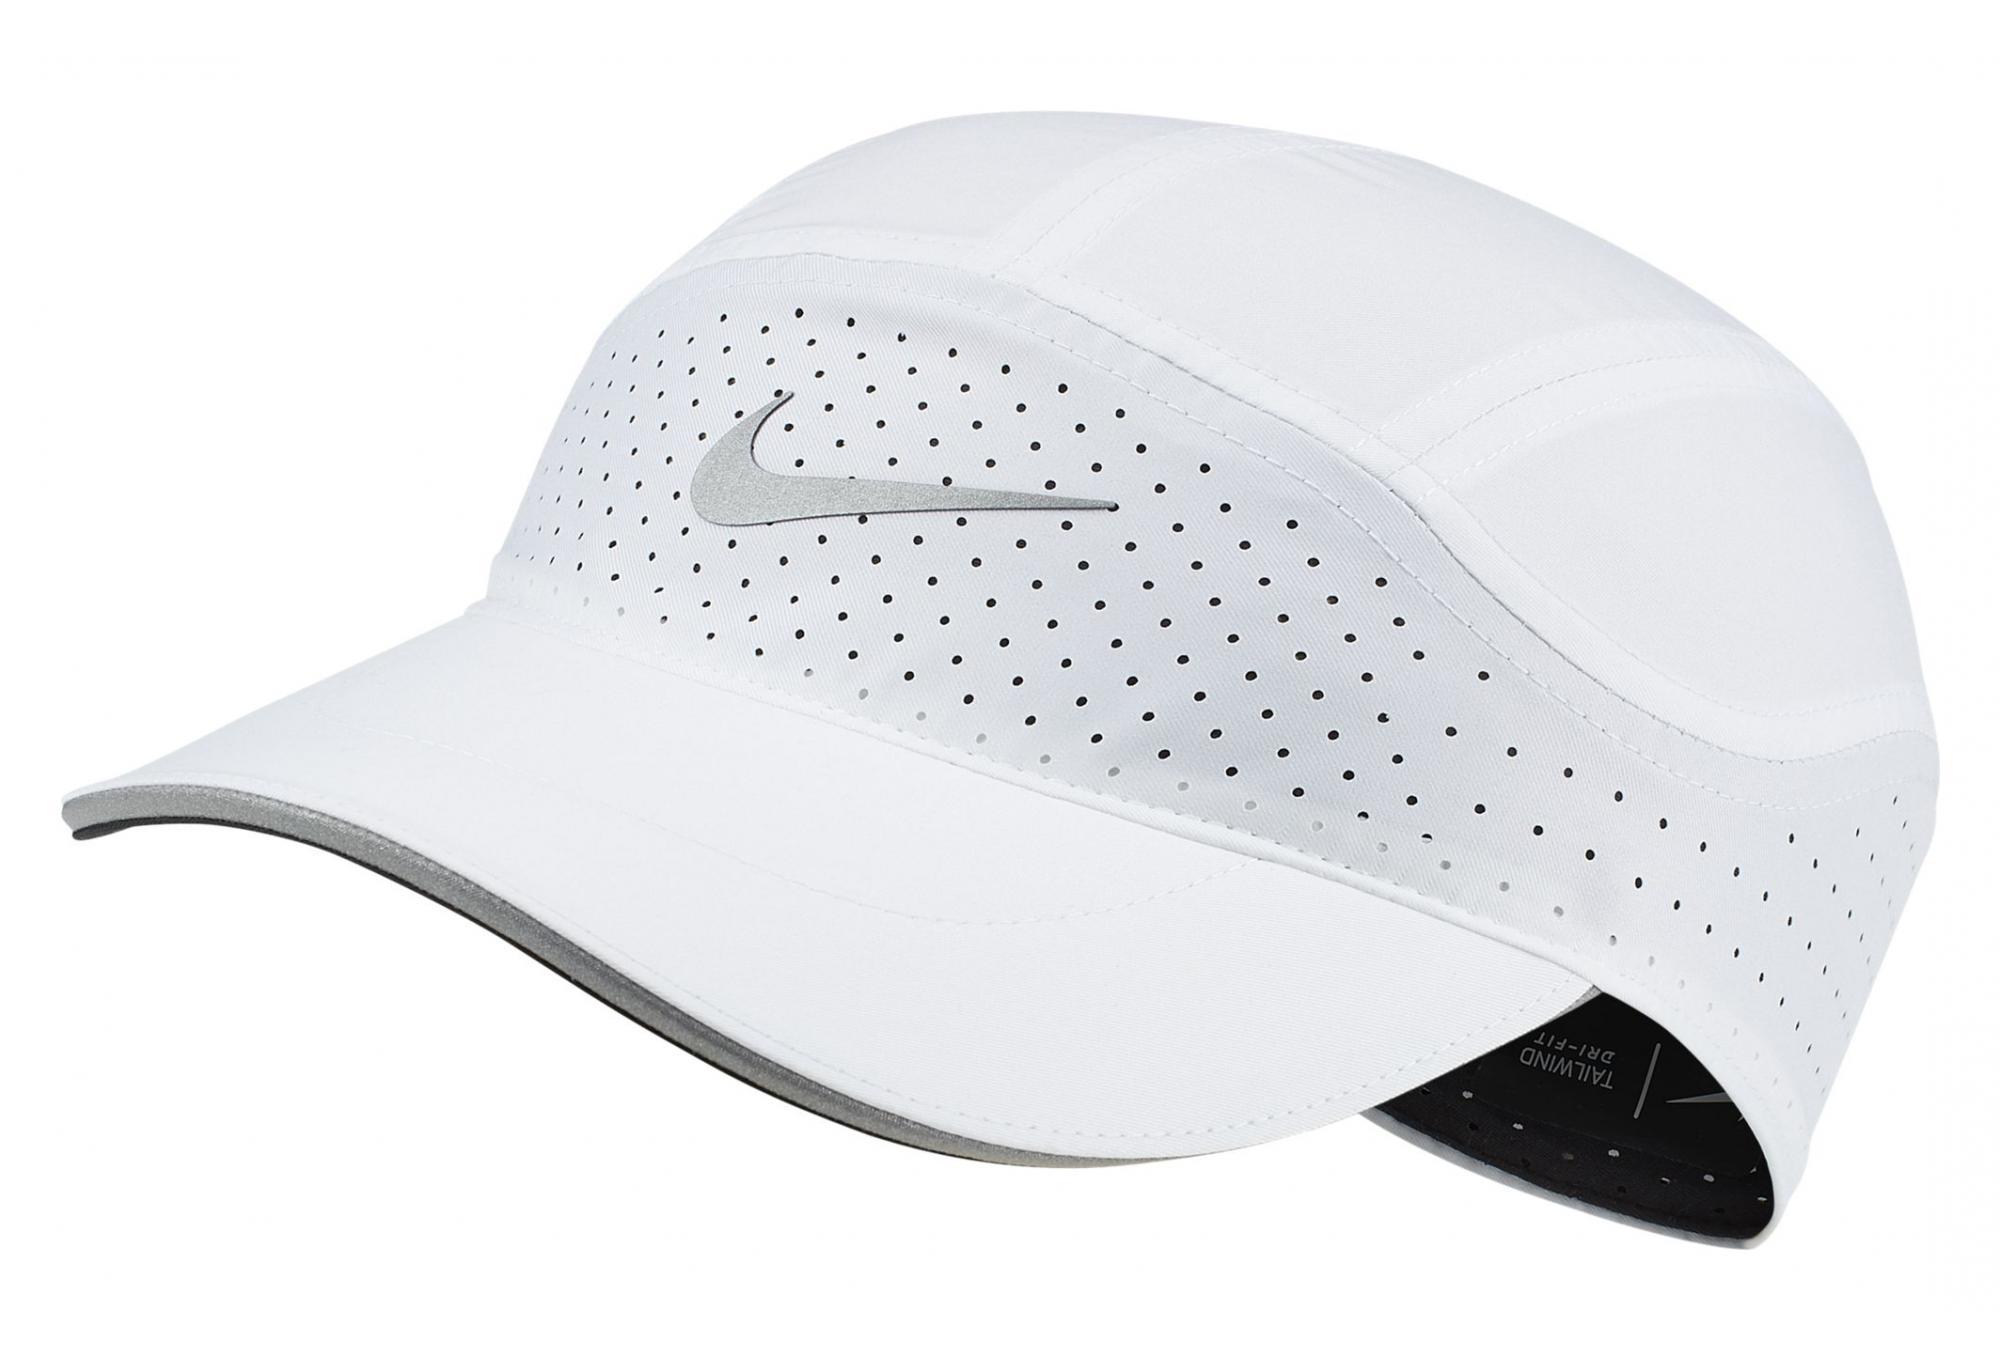 e02c017ce Nike AeroBill Tailwind Cap White